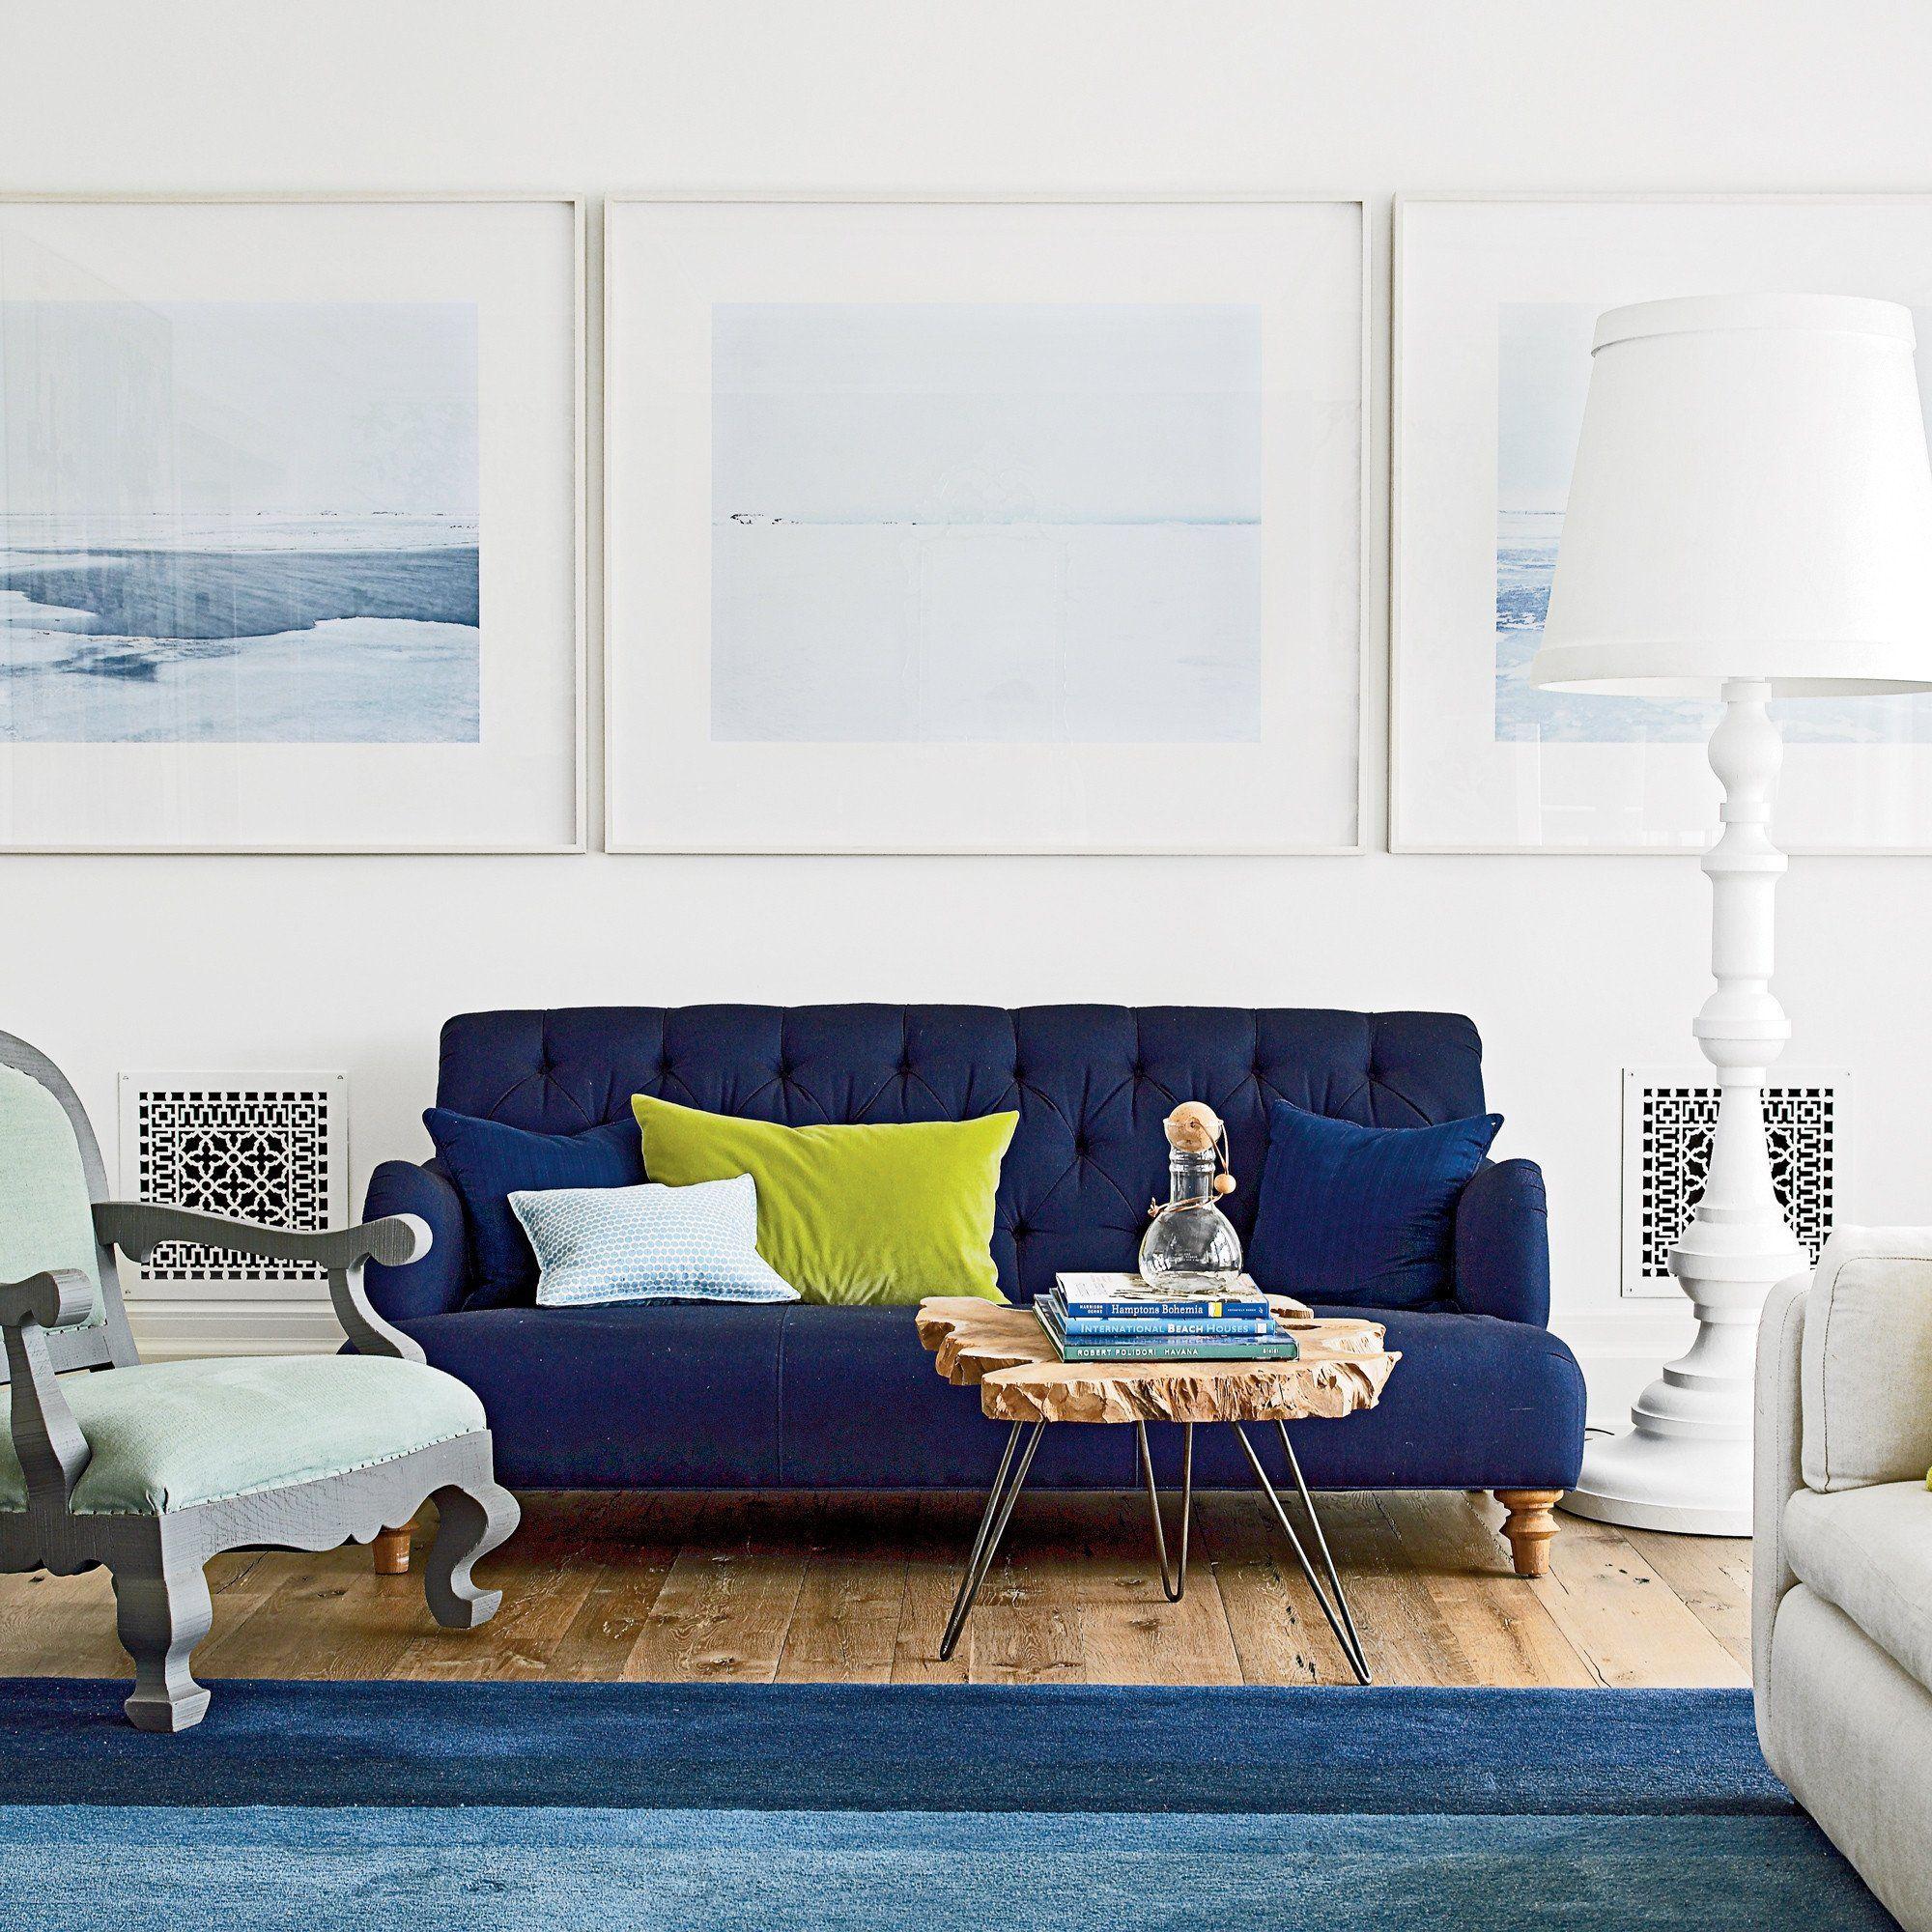 Decorating Color Schemes For Living Room Pick Perfect Living Room Color Palette Coast Living Room Color Schemes Living Room Decor Colors Blue Couch Living Room